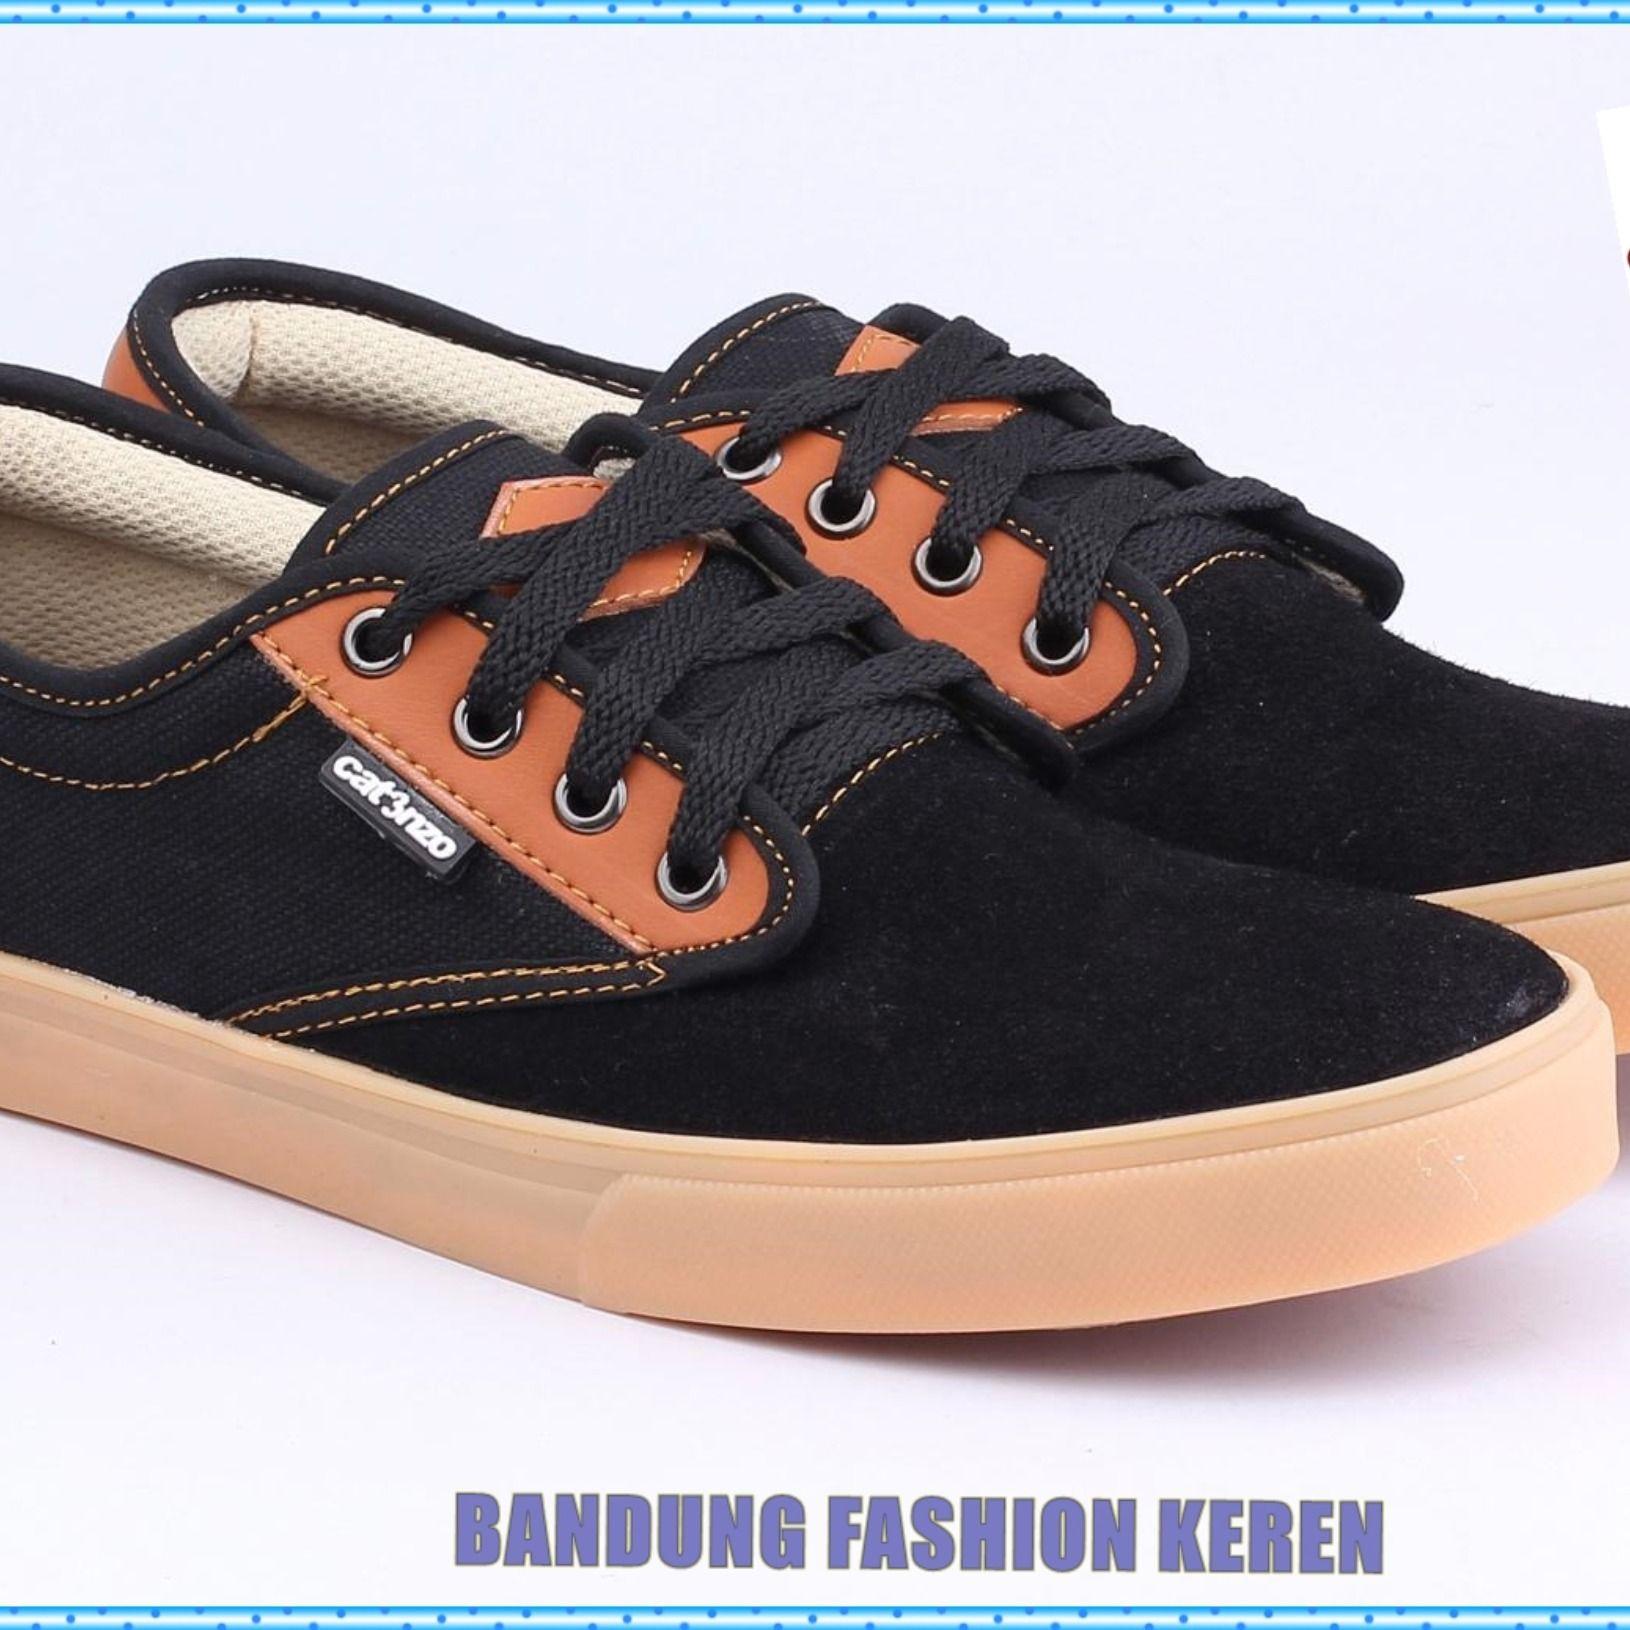 Sepatu Casual Pria Ba 5016 Produk Fashion Handmade Terbaik 100